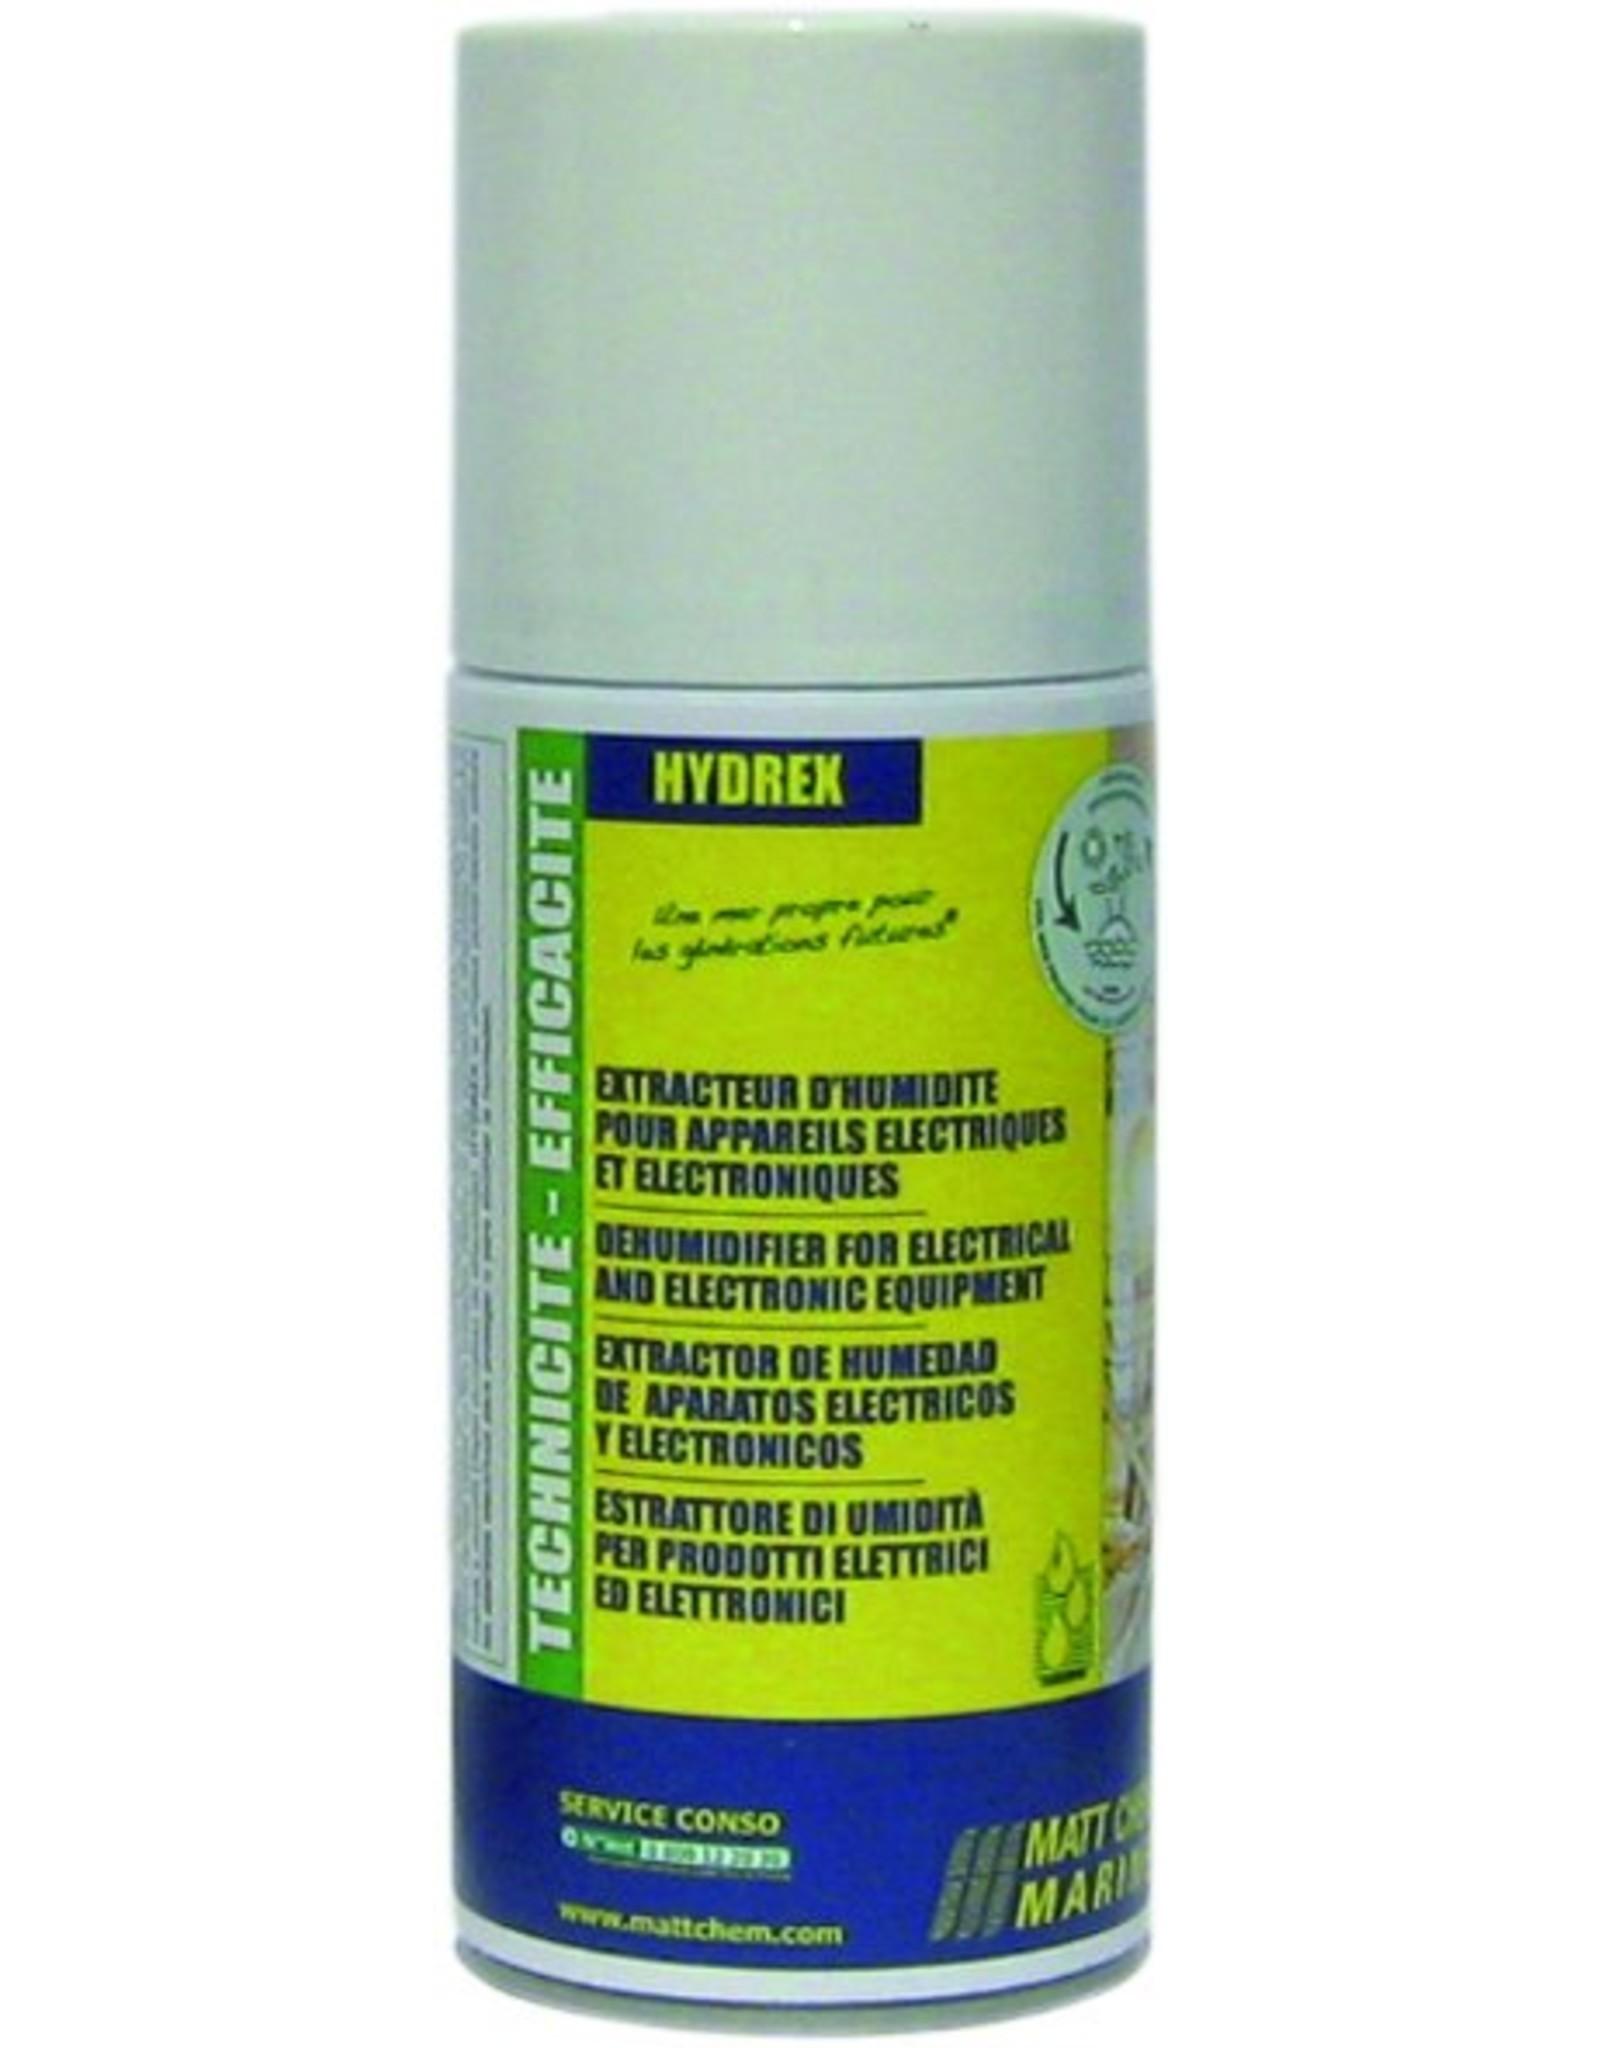 Matt Chem Marine HYDREX150ml aerosol